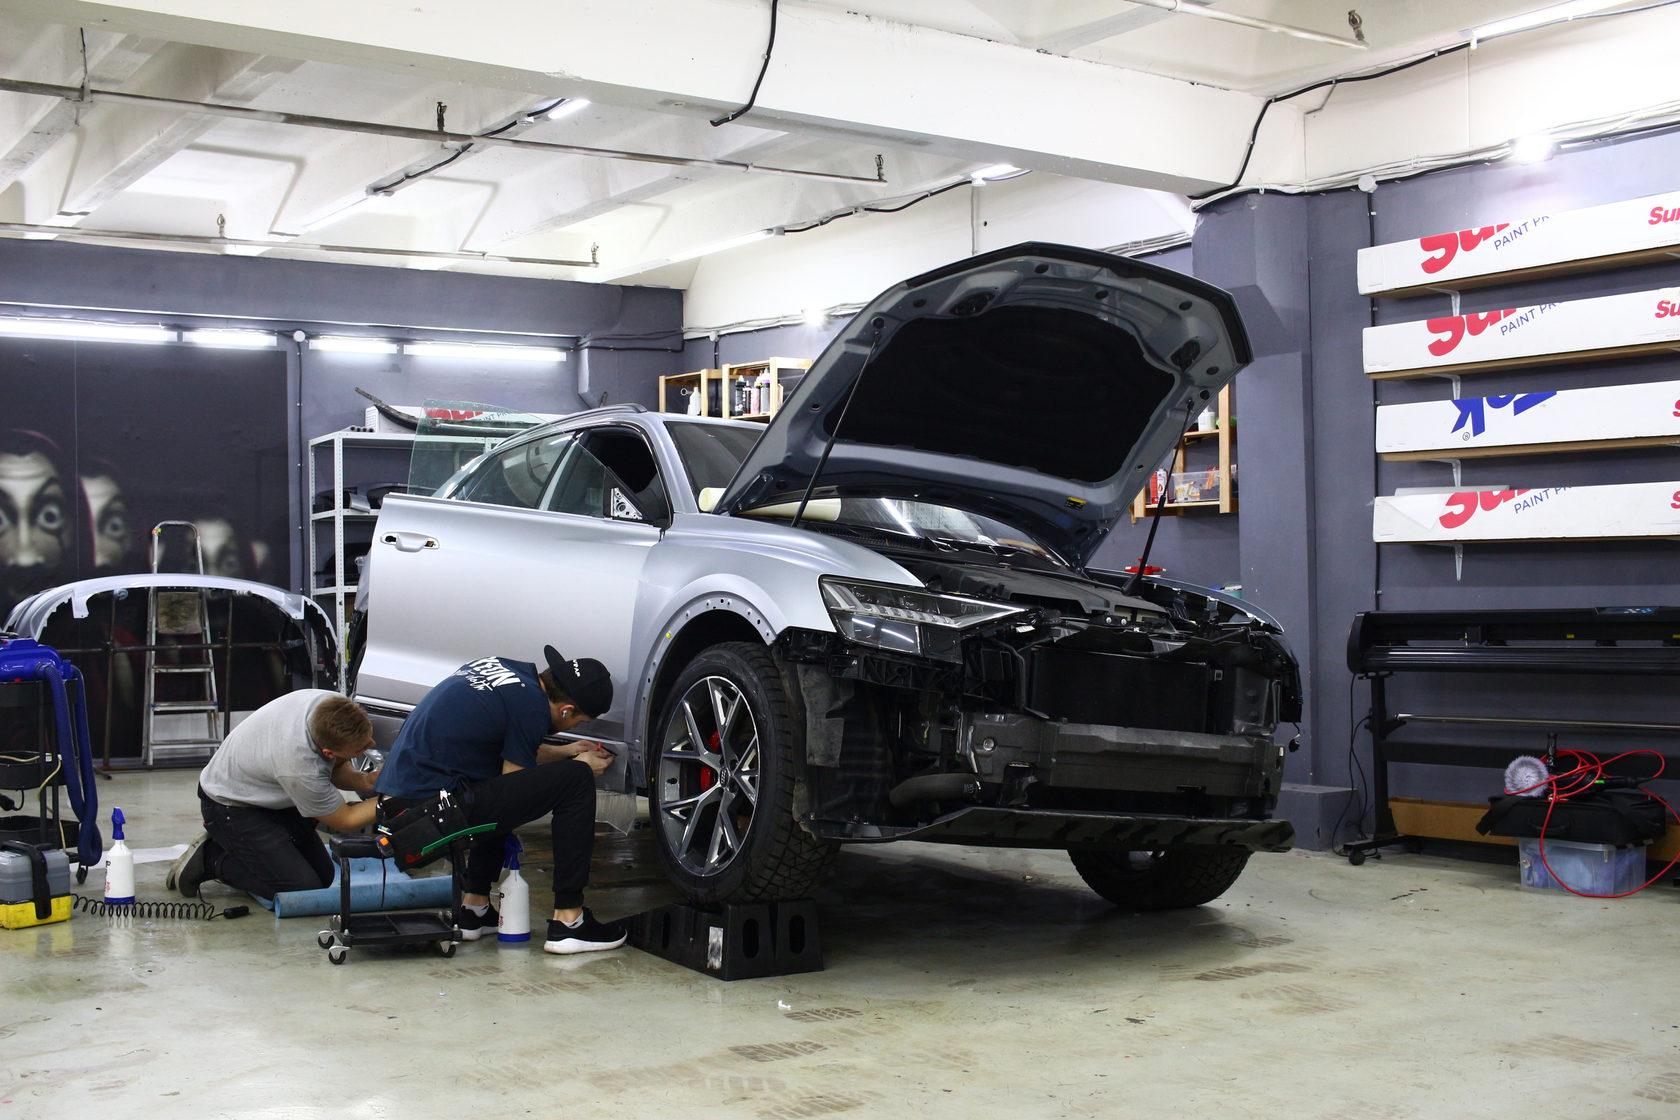 Audi q8, матовая пленка для авто, защитная пленка, detailing geeks, детейлинг гикс, антигравийная пленка, бронепленка, защита от сколов